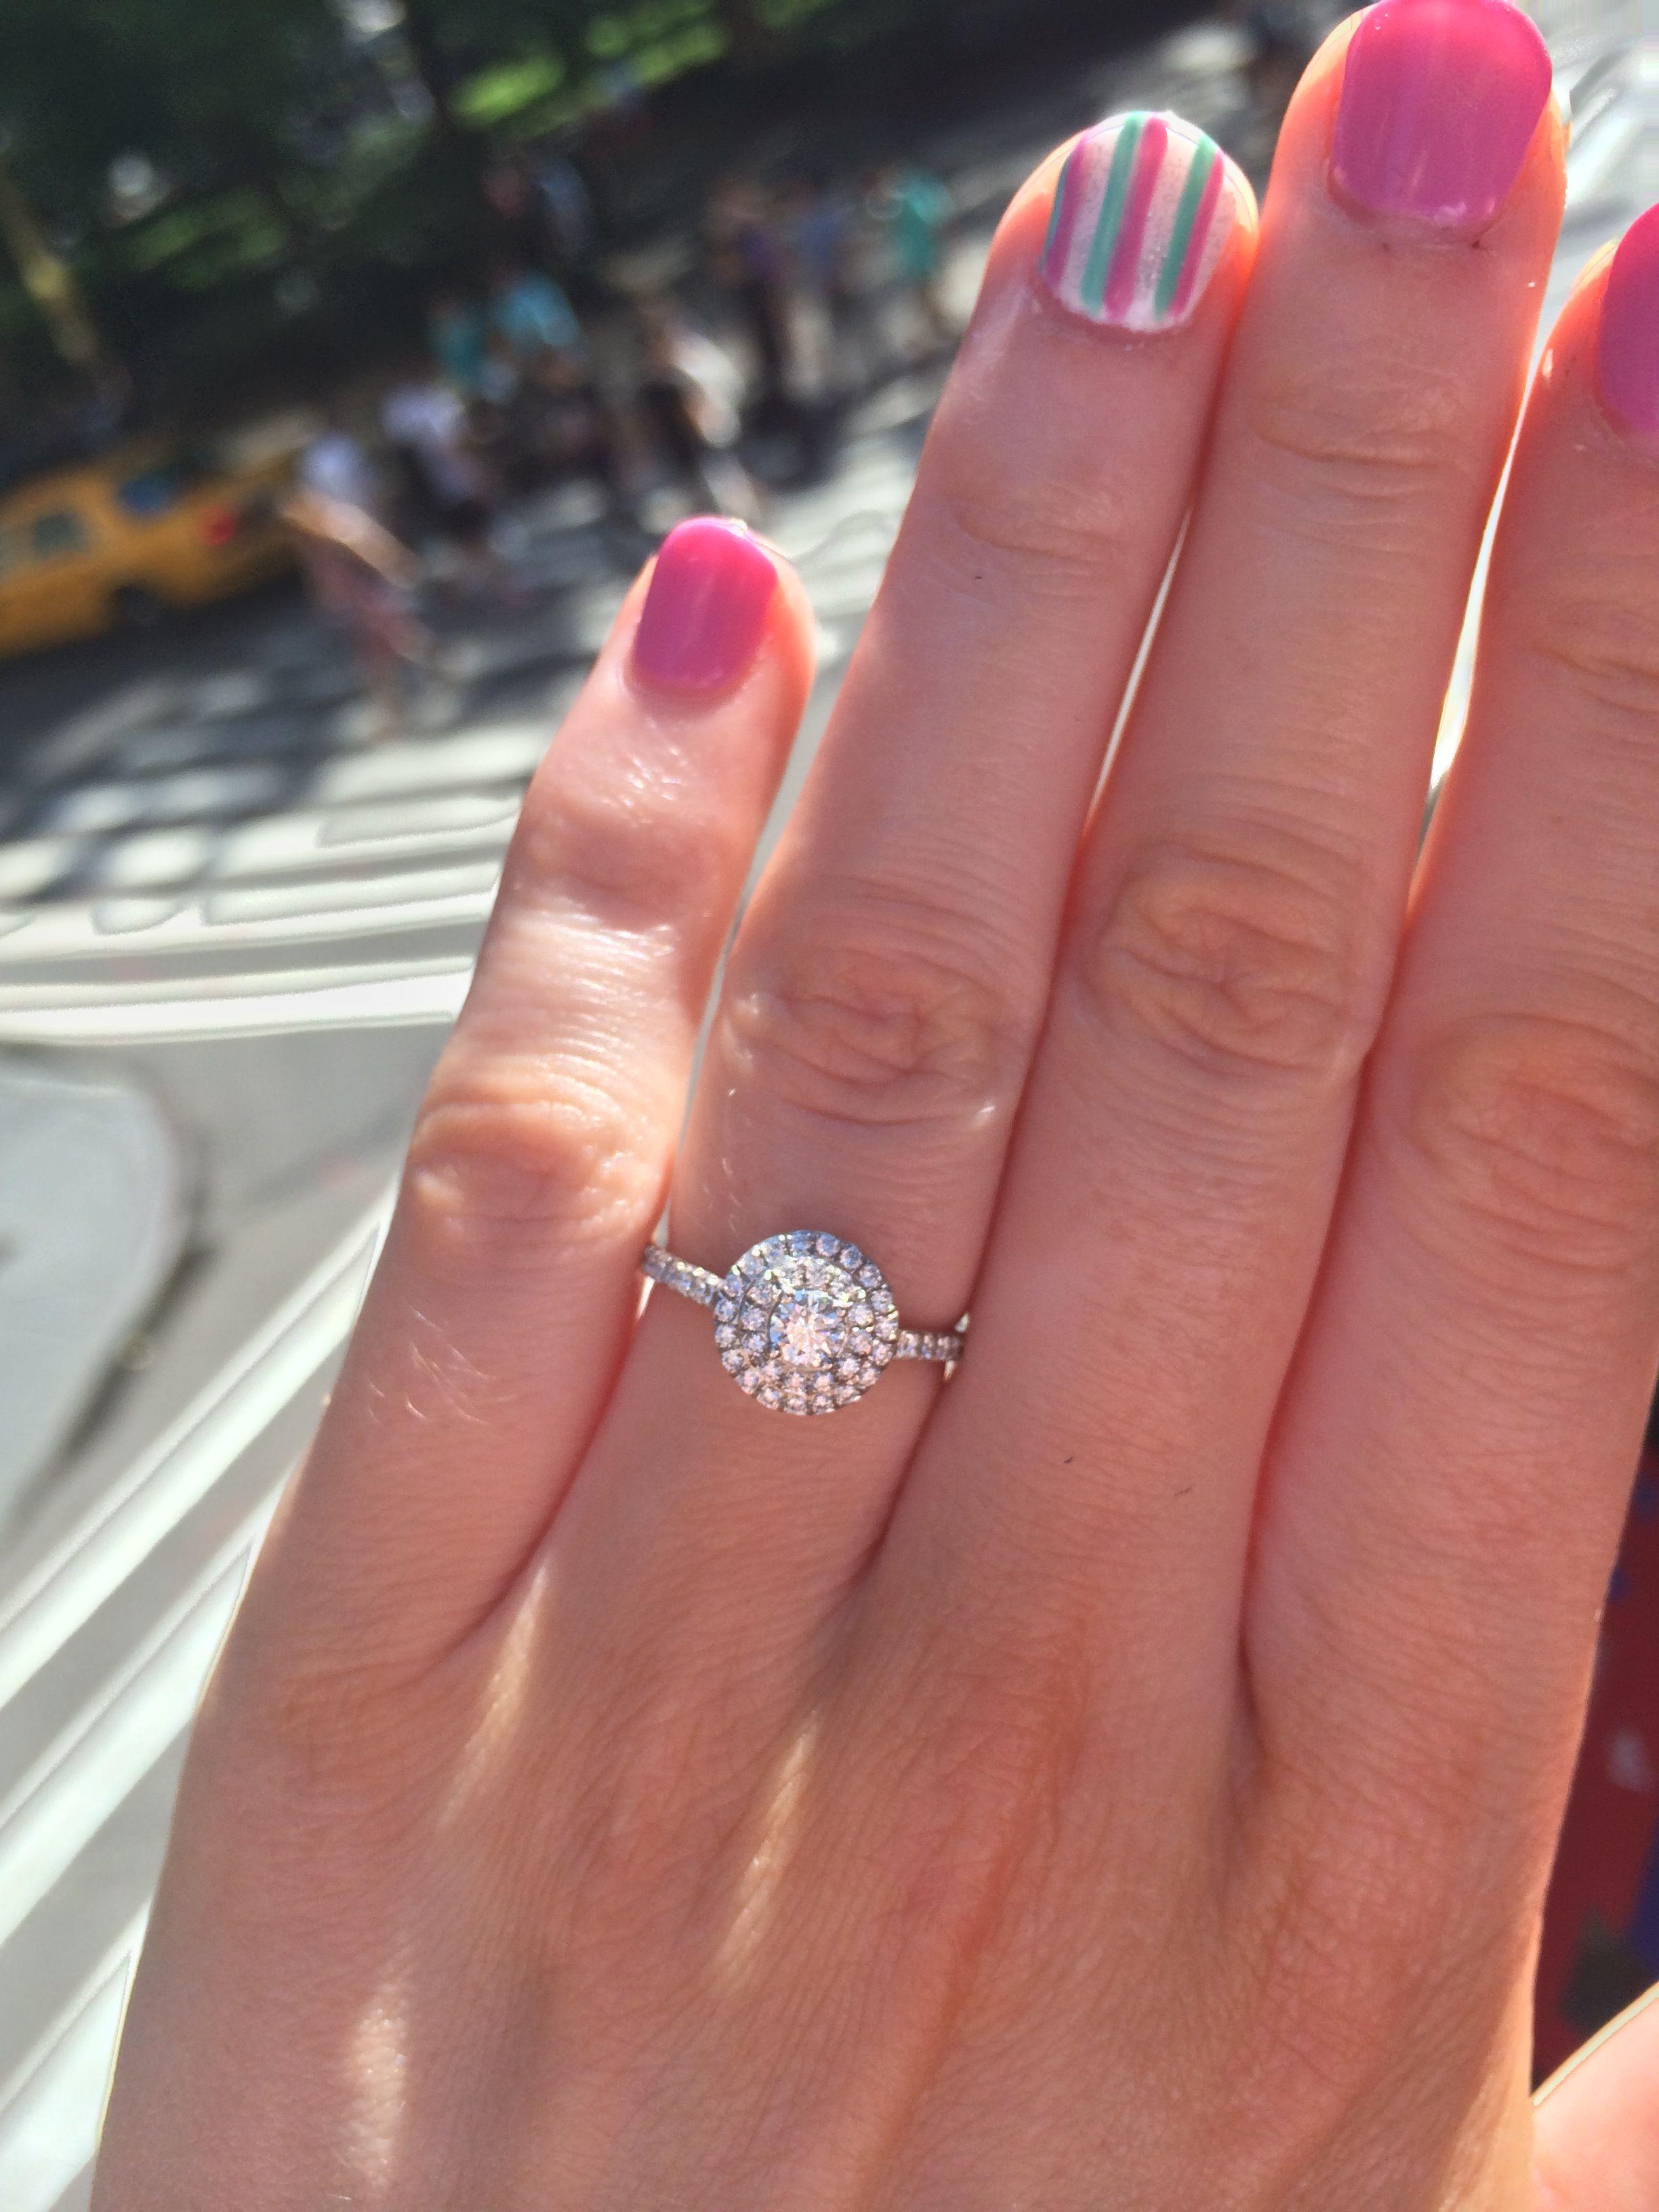 11cb6ef4c0ed8e Tiffany soleste round | Wedding | Engagement rings, Dream engagement ...